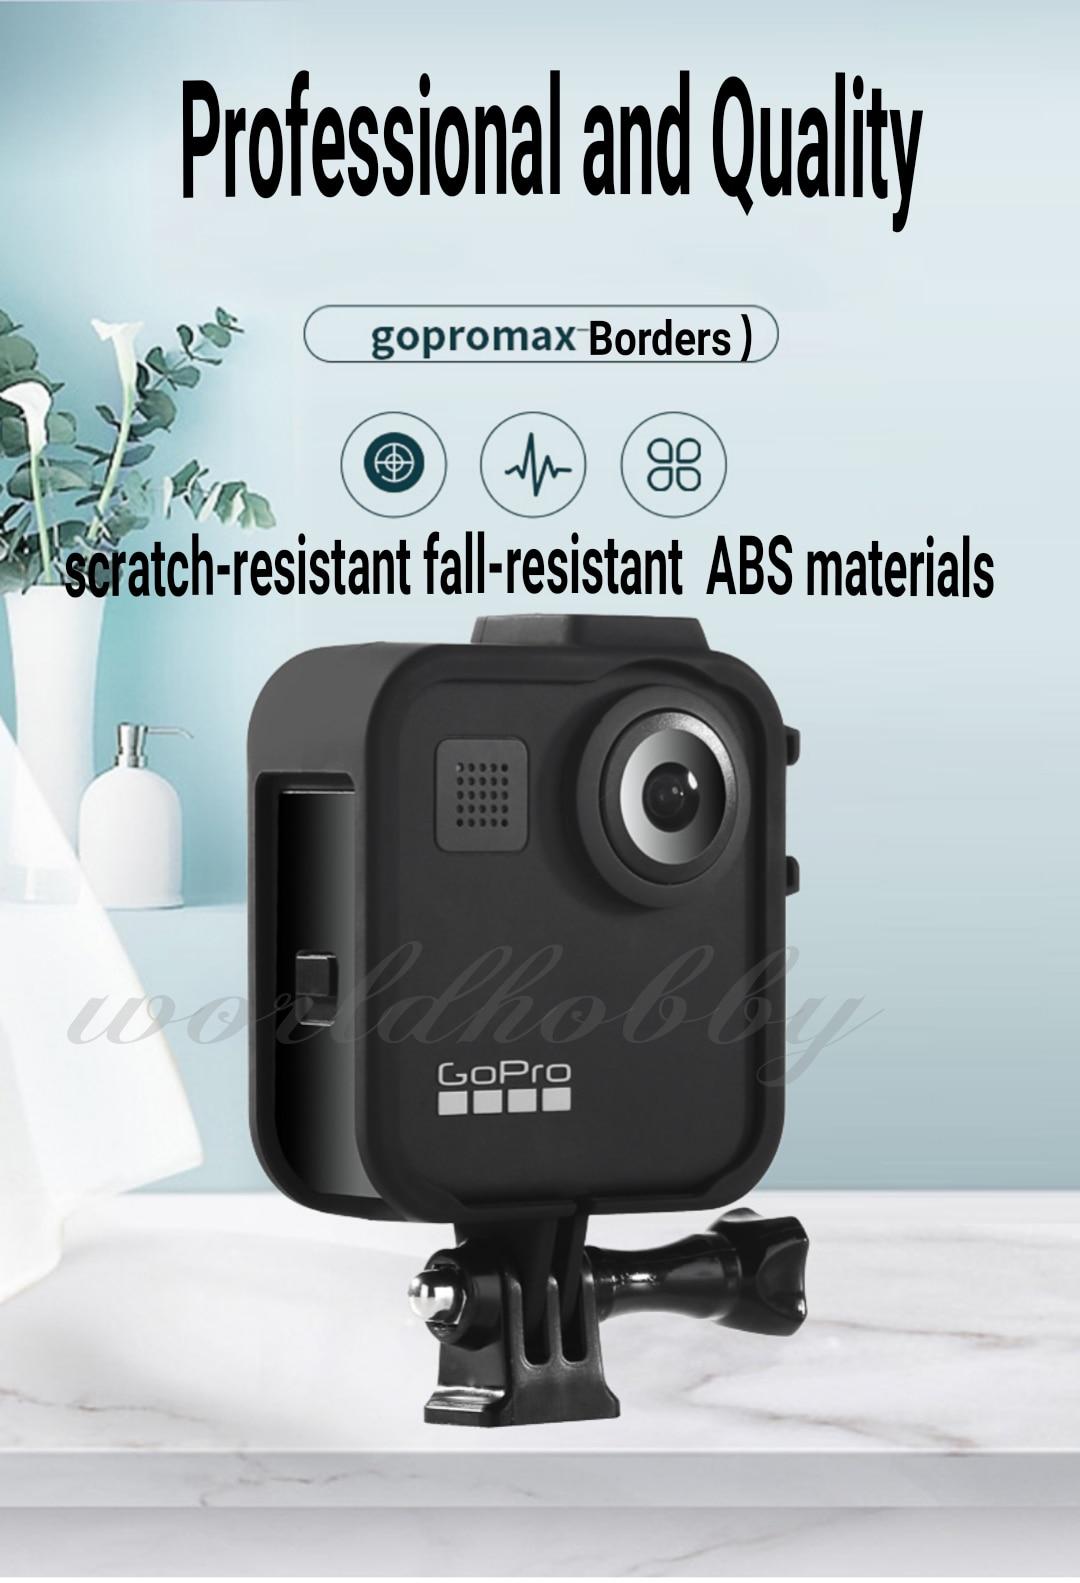 Gopro max sports camera host border Plastic protection box